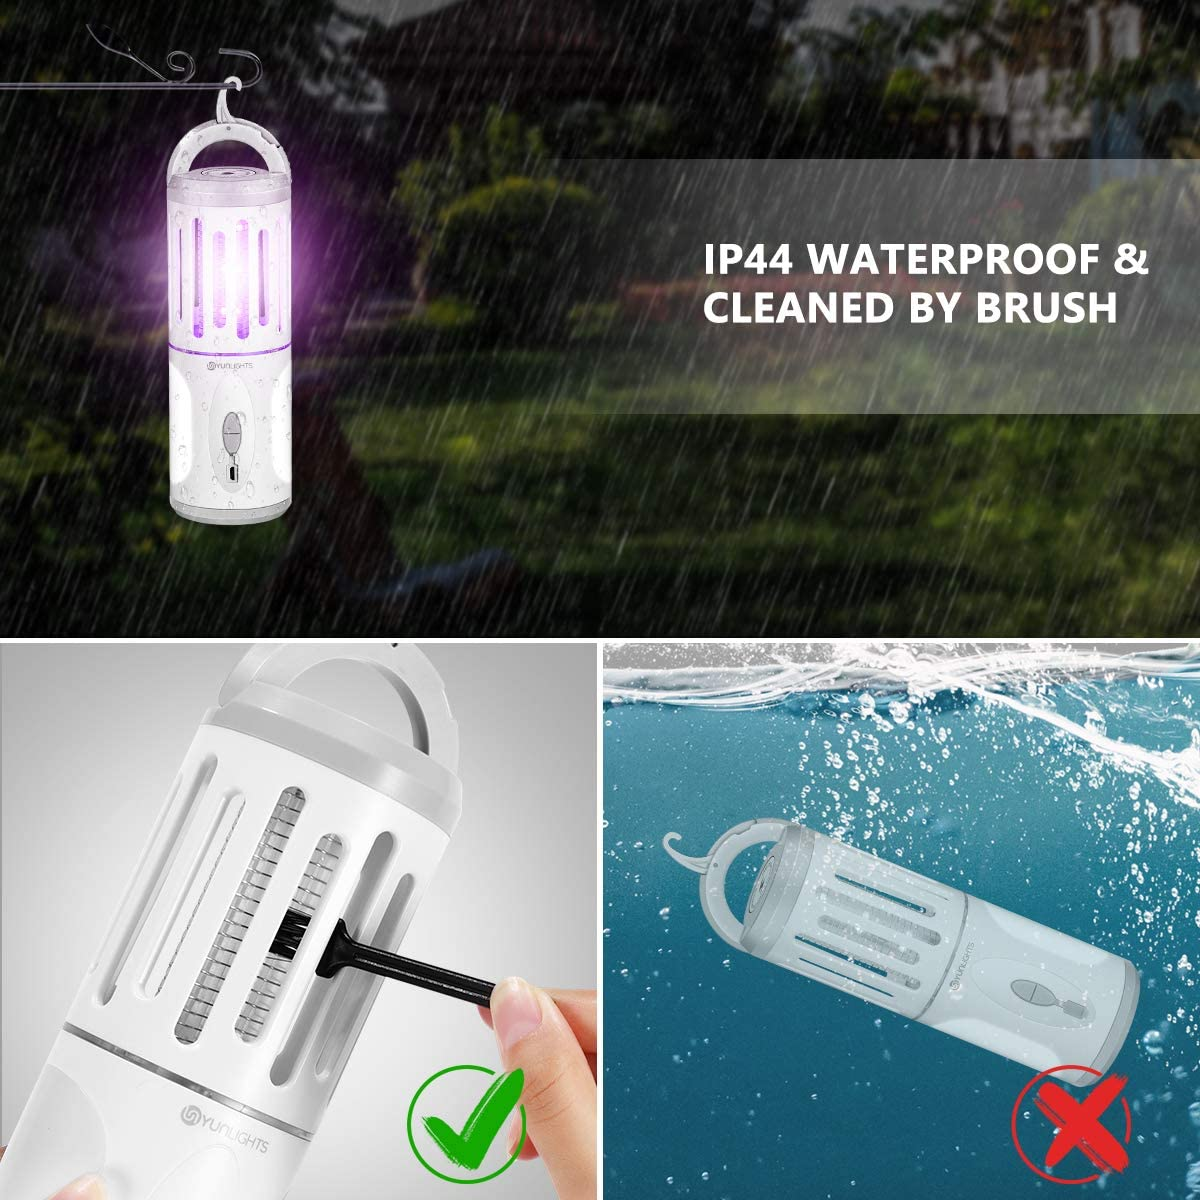 Electronic Mosquito Killer and Lighting, Portable UV Bug Zapper USB Rechargeable Waterproof Emergency Lantern for Indoor & Outdoor